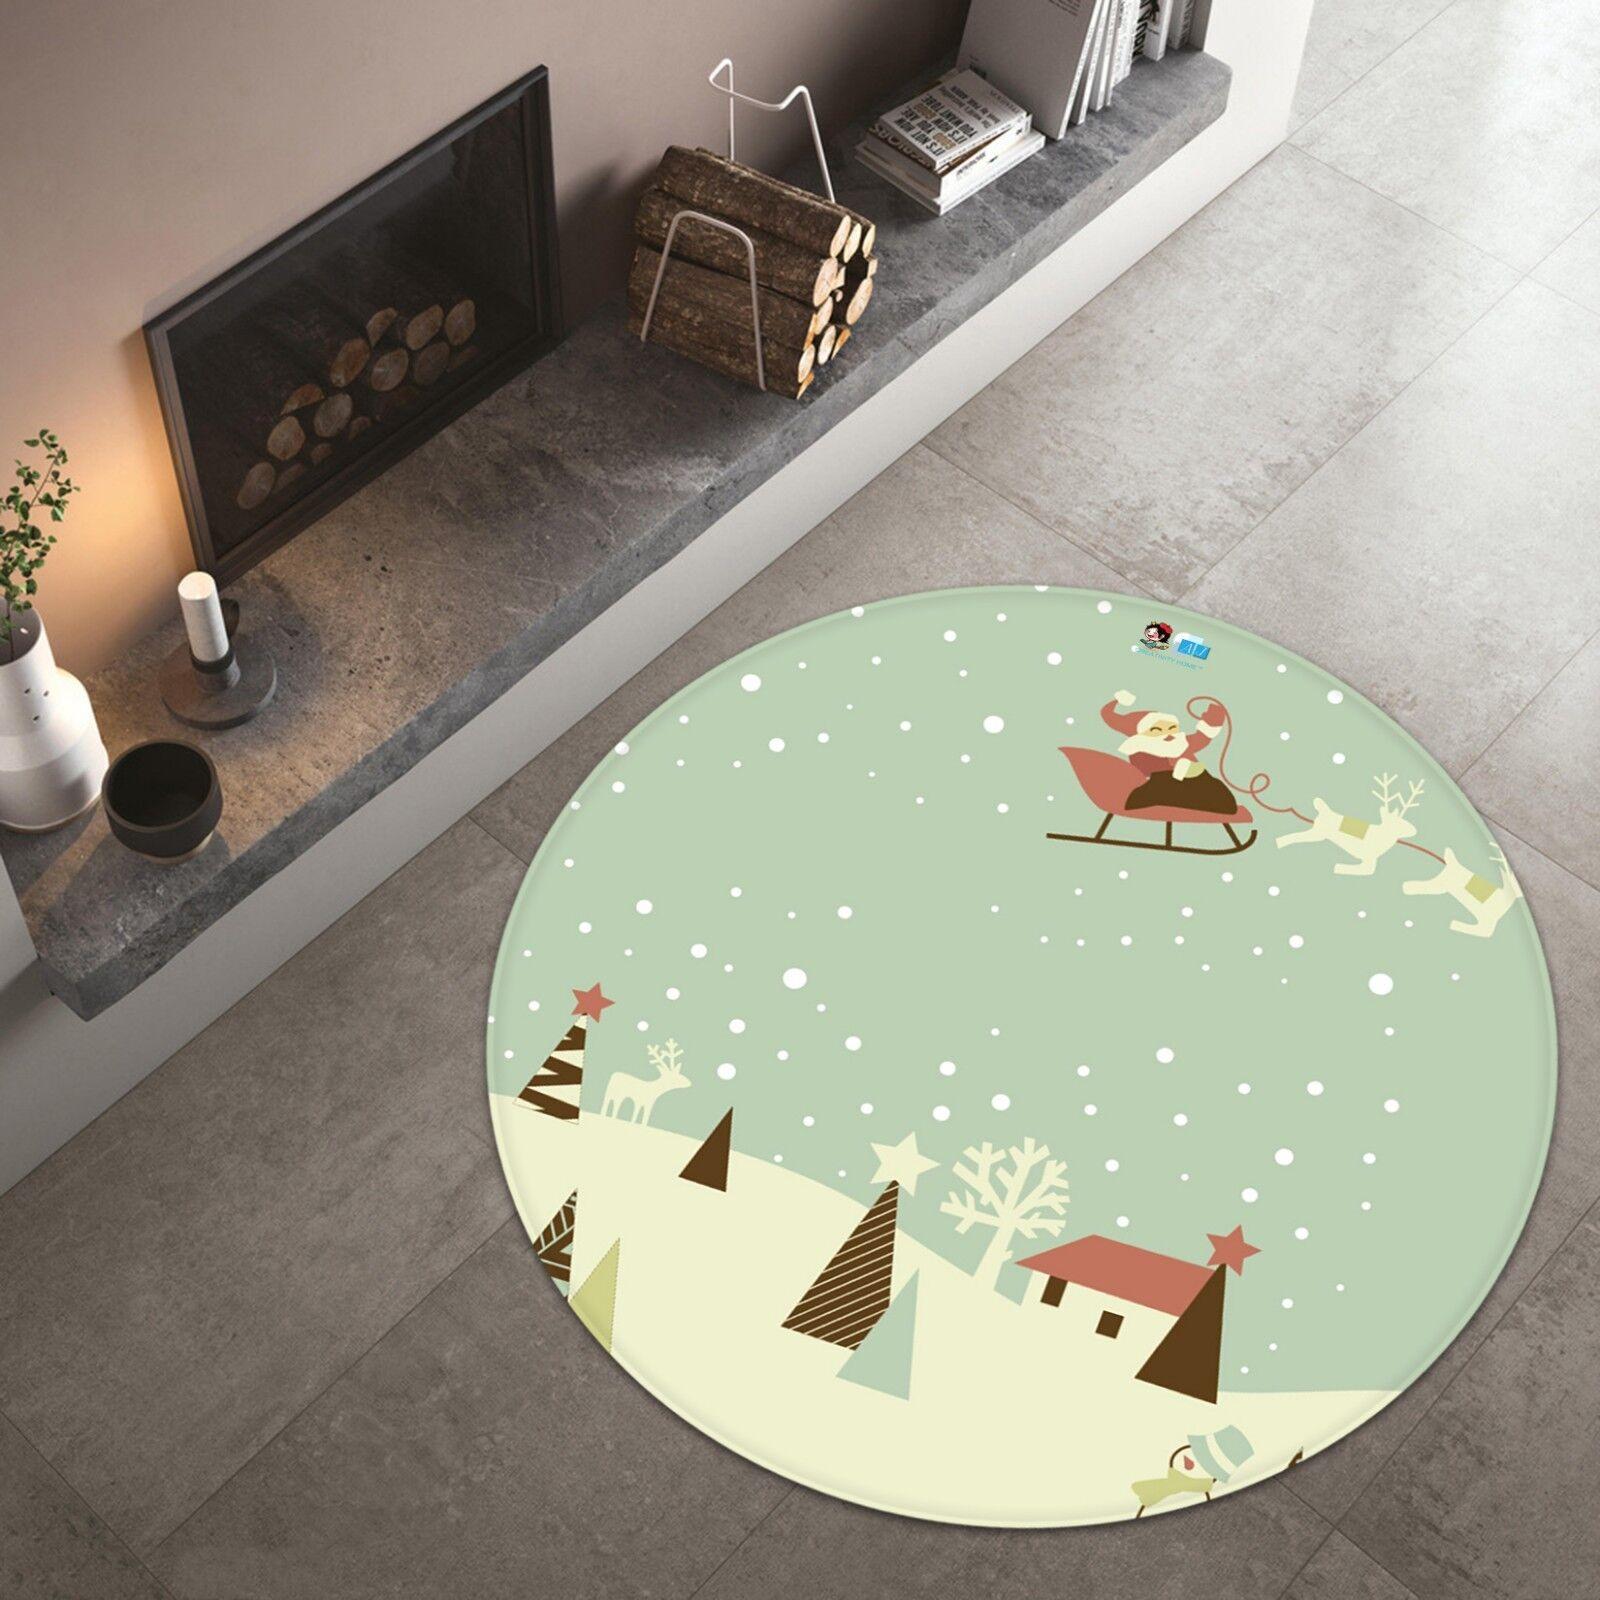 3D Natale Xmas Pattern 34 tappetino antiscivolo tappeto camera tappetino tappeto rossoondo elegante UK